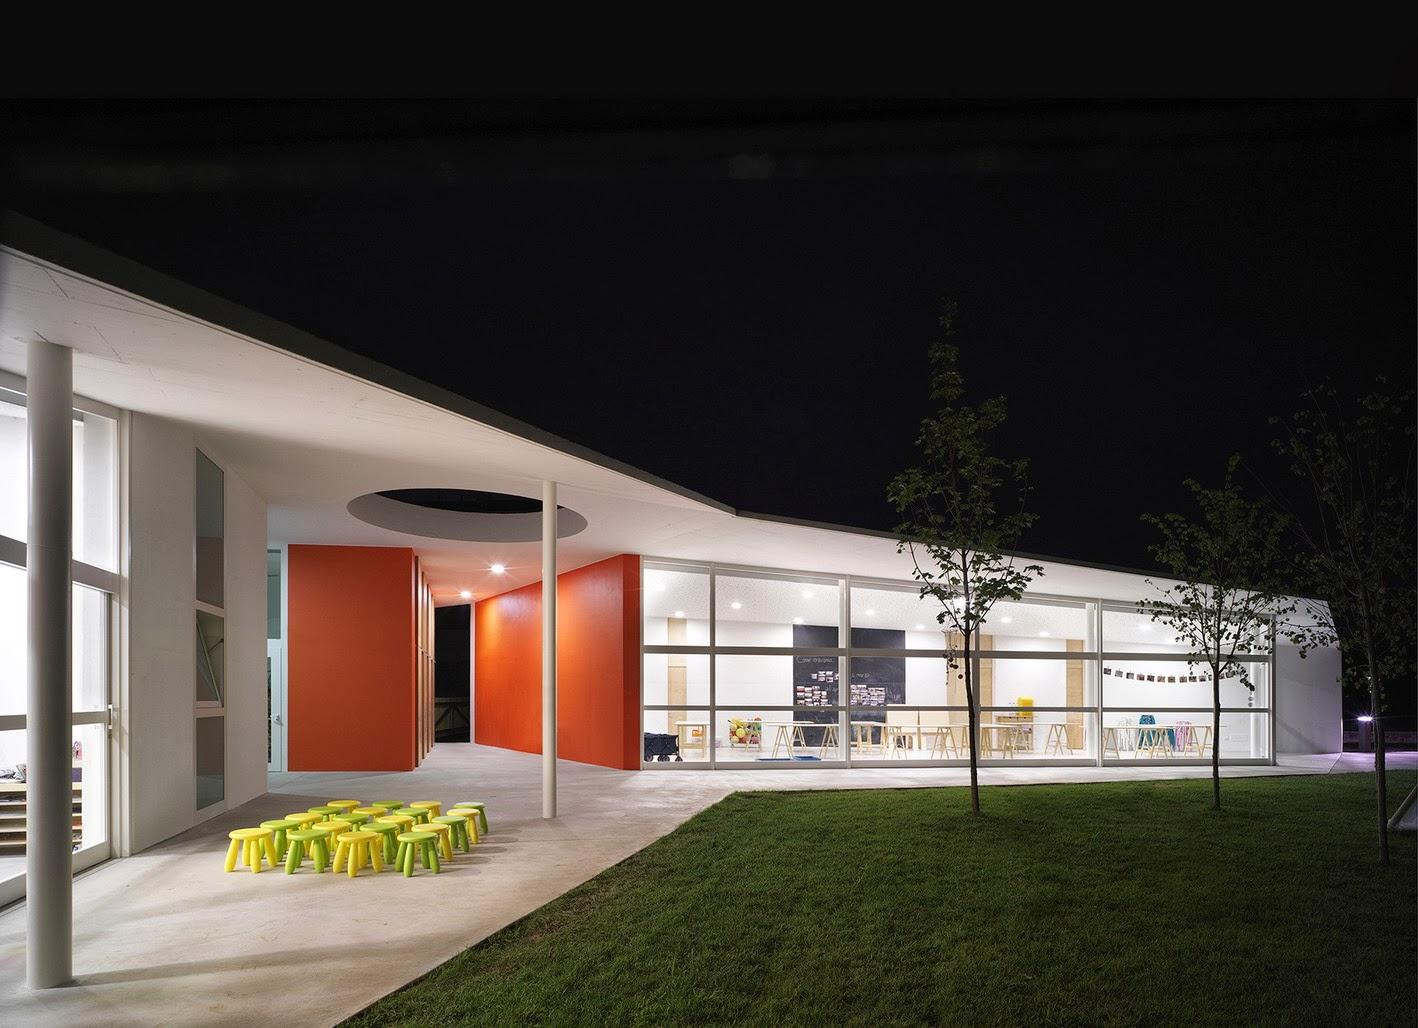 arquitectura zona cero: enero 2014 - photo#28